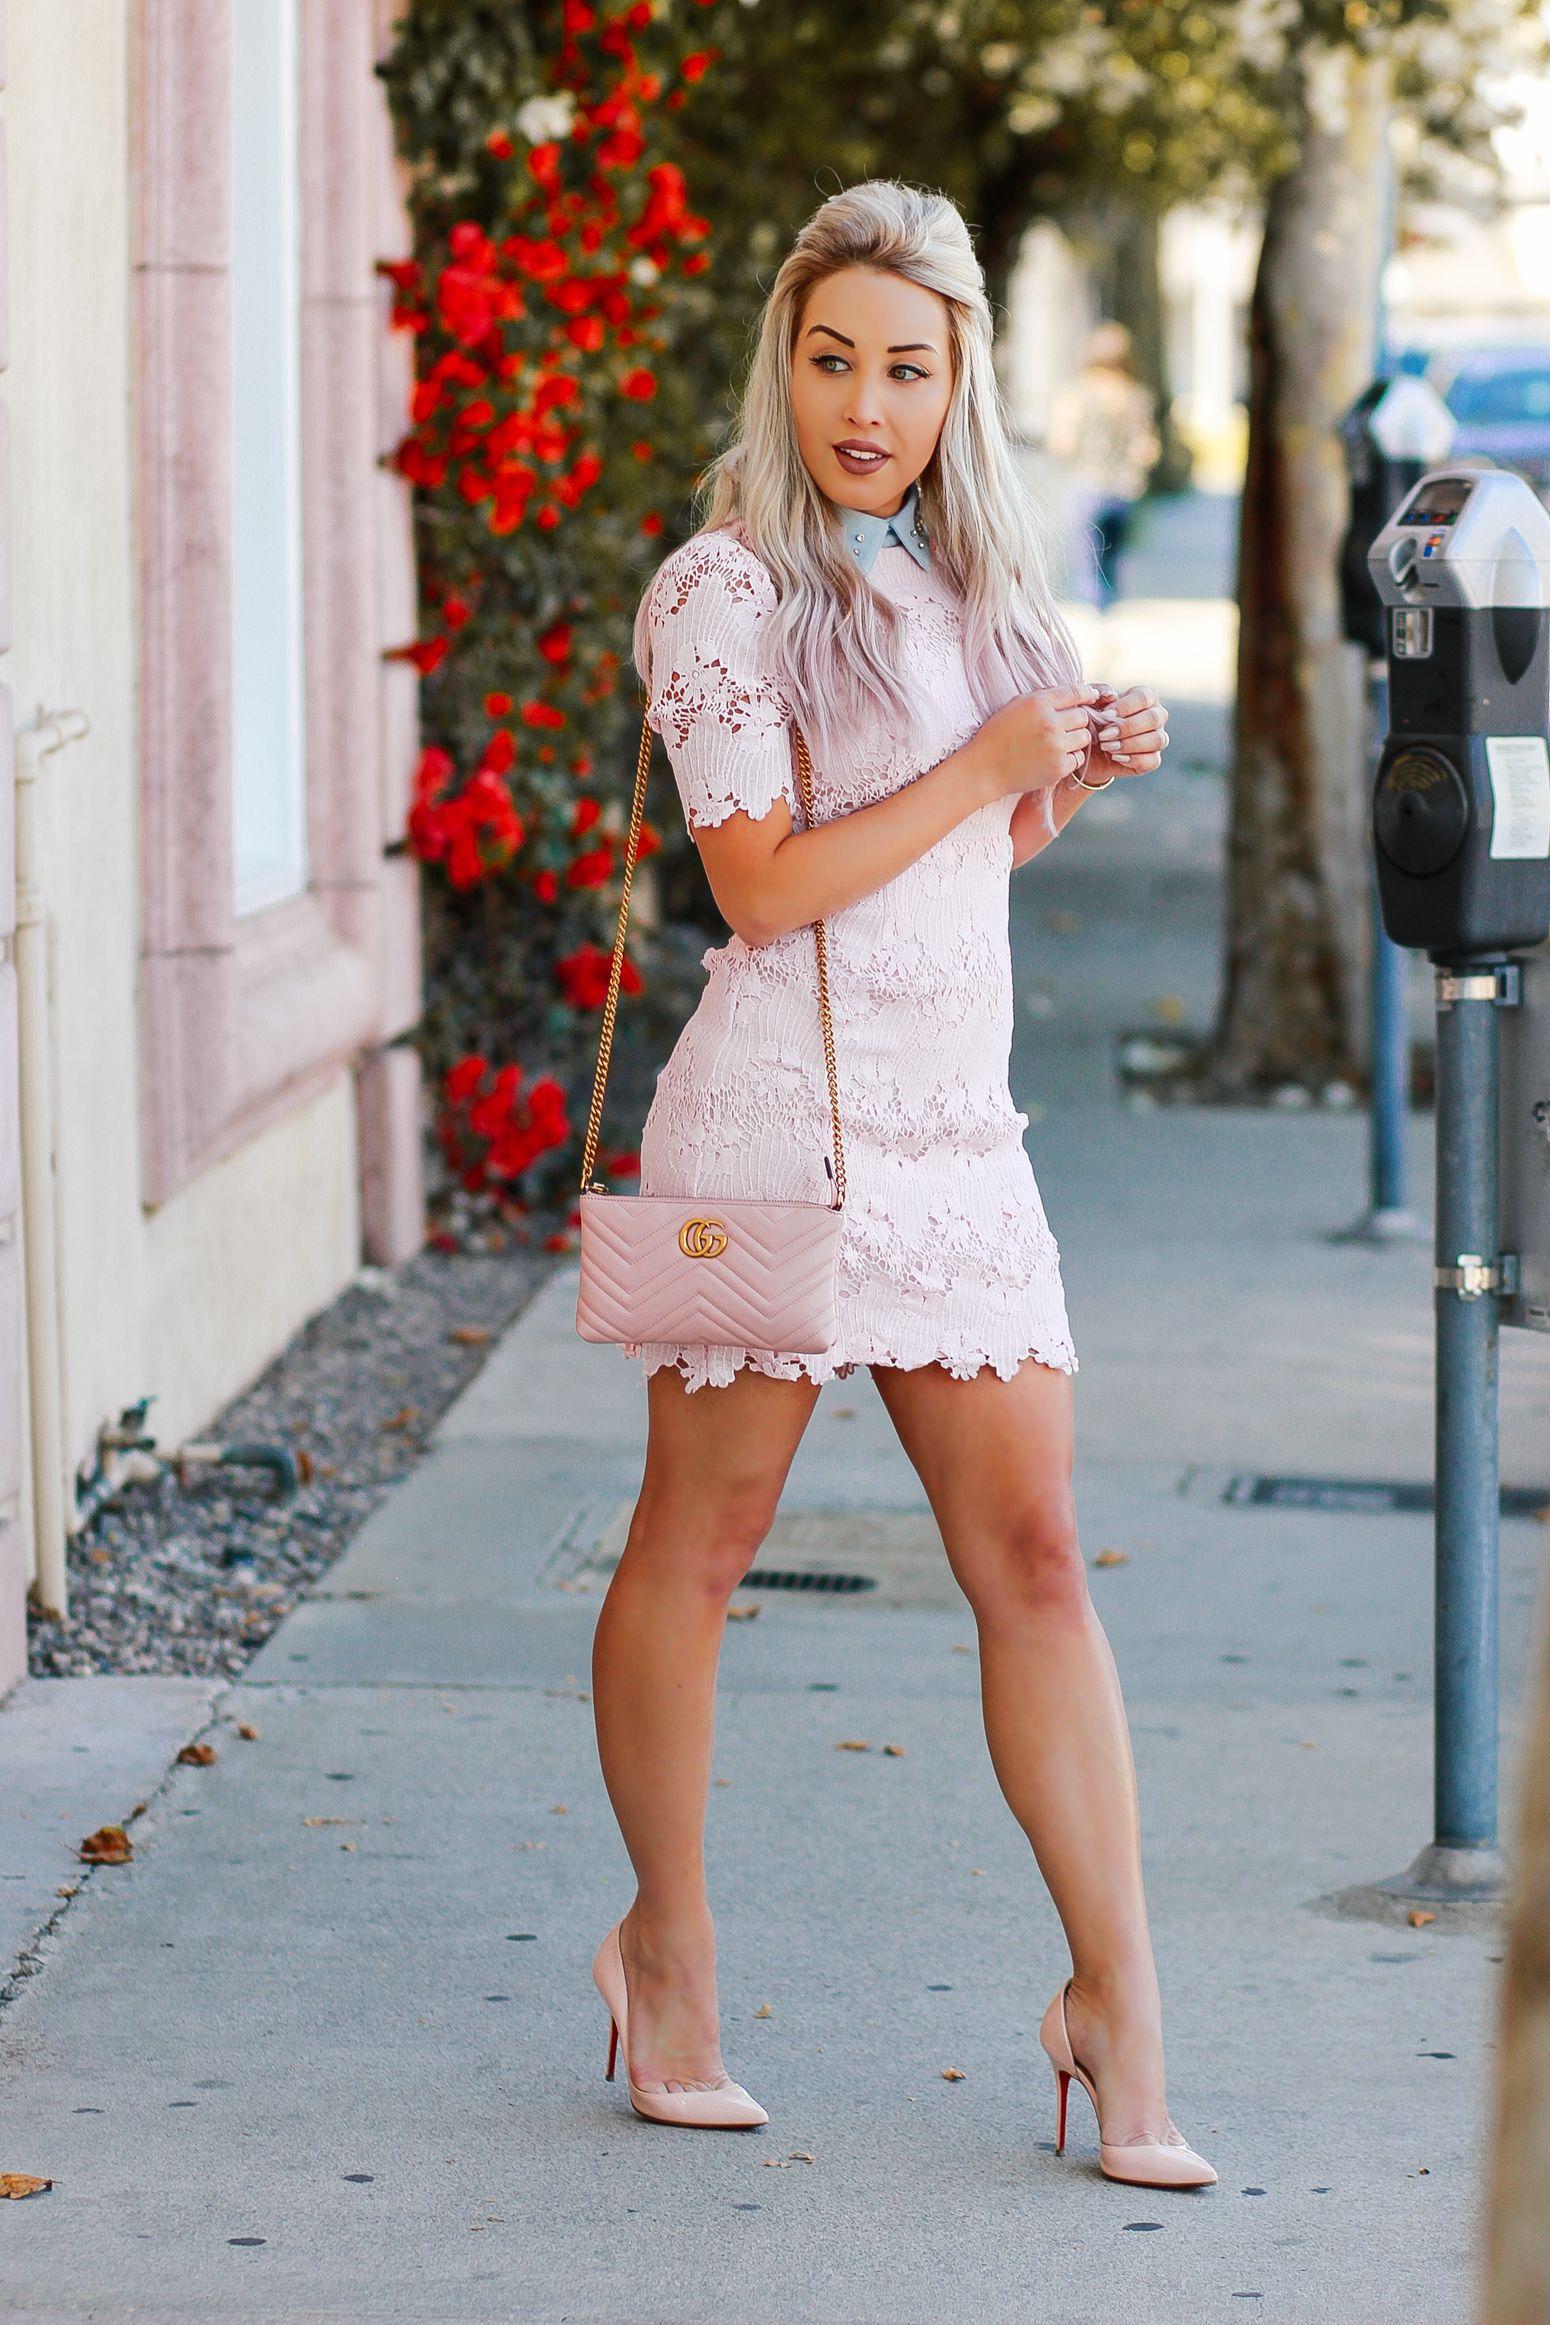 Gossip Girl/Blair Waldorf Vibes | Legs | Gossip girl blair